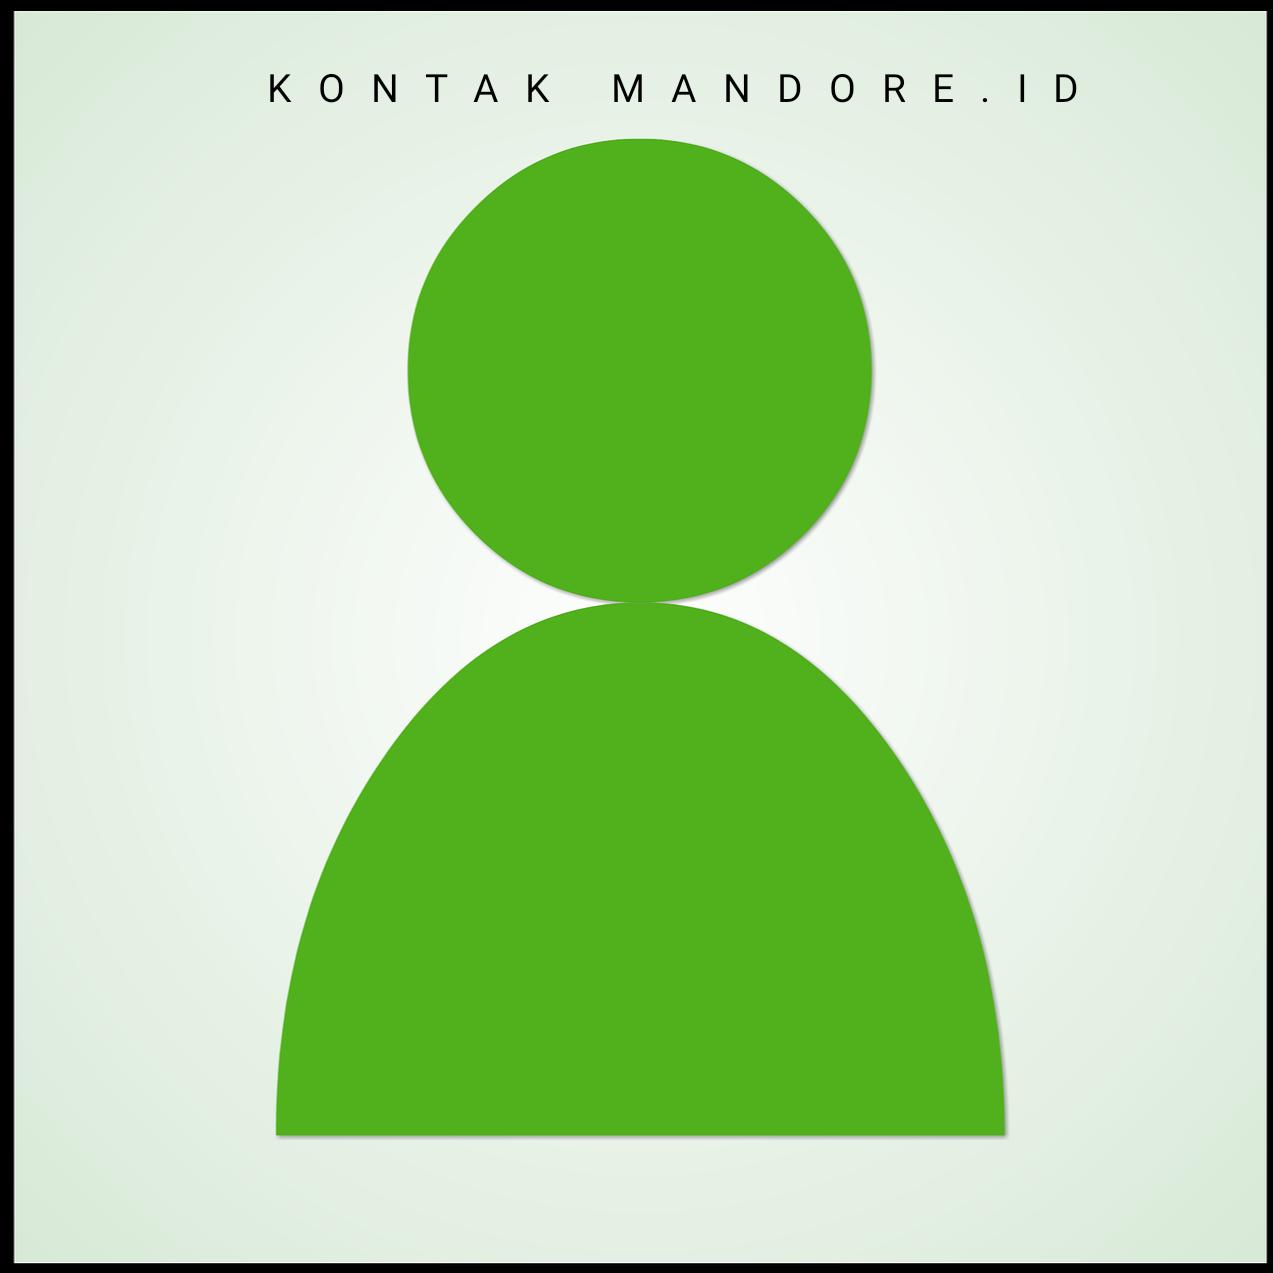 Kontak Mandore.id